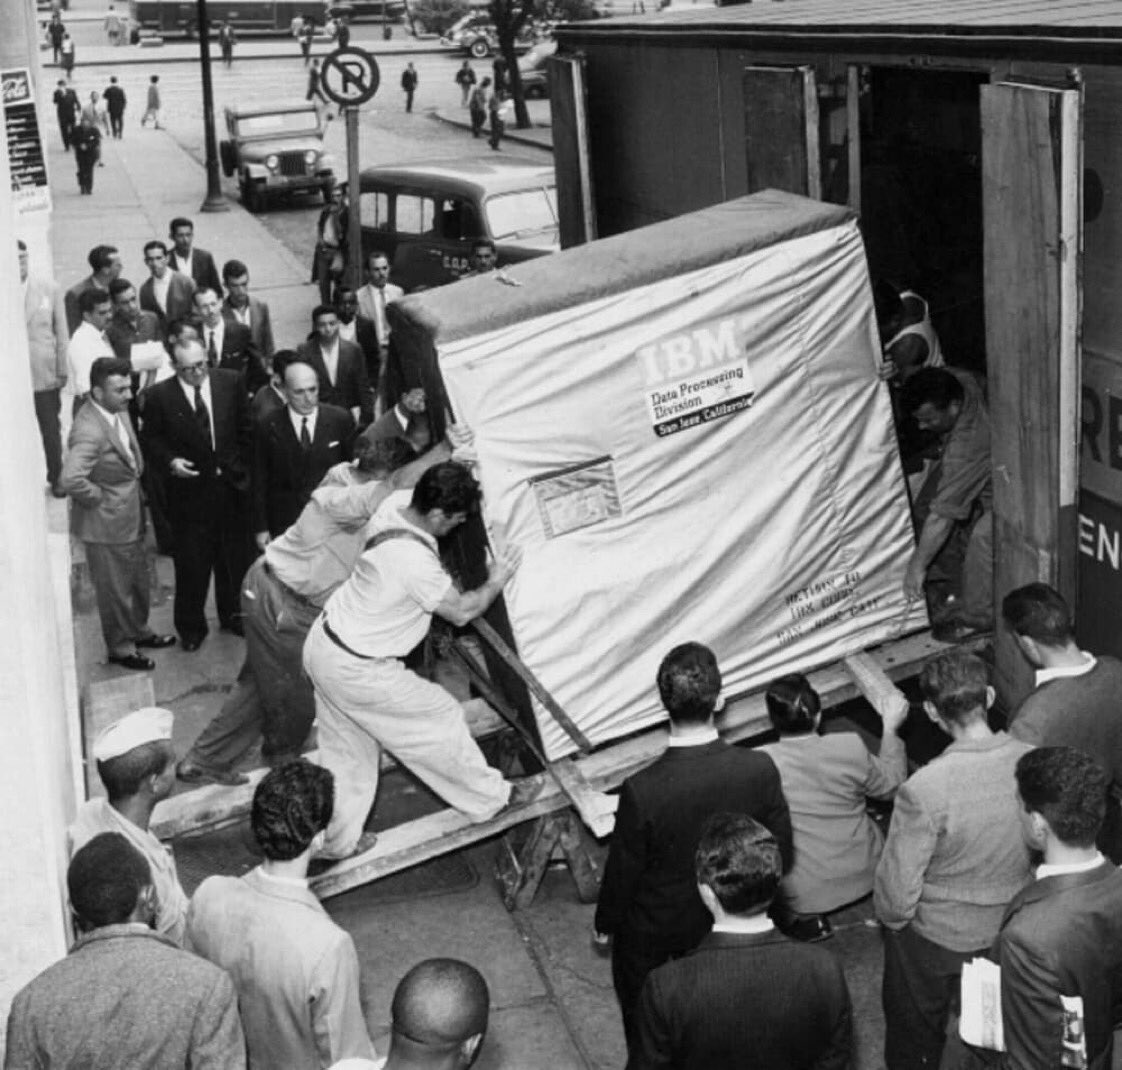 これが1956年IBM製のHDD、容量5MBでこの大きさ!